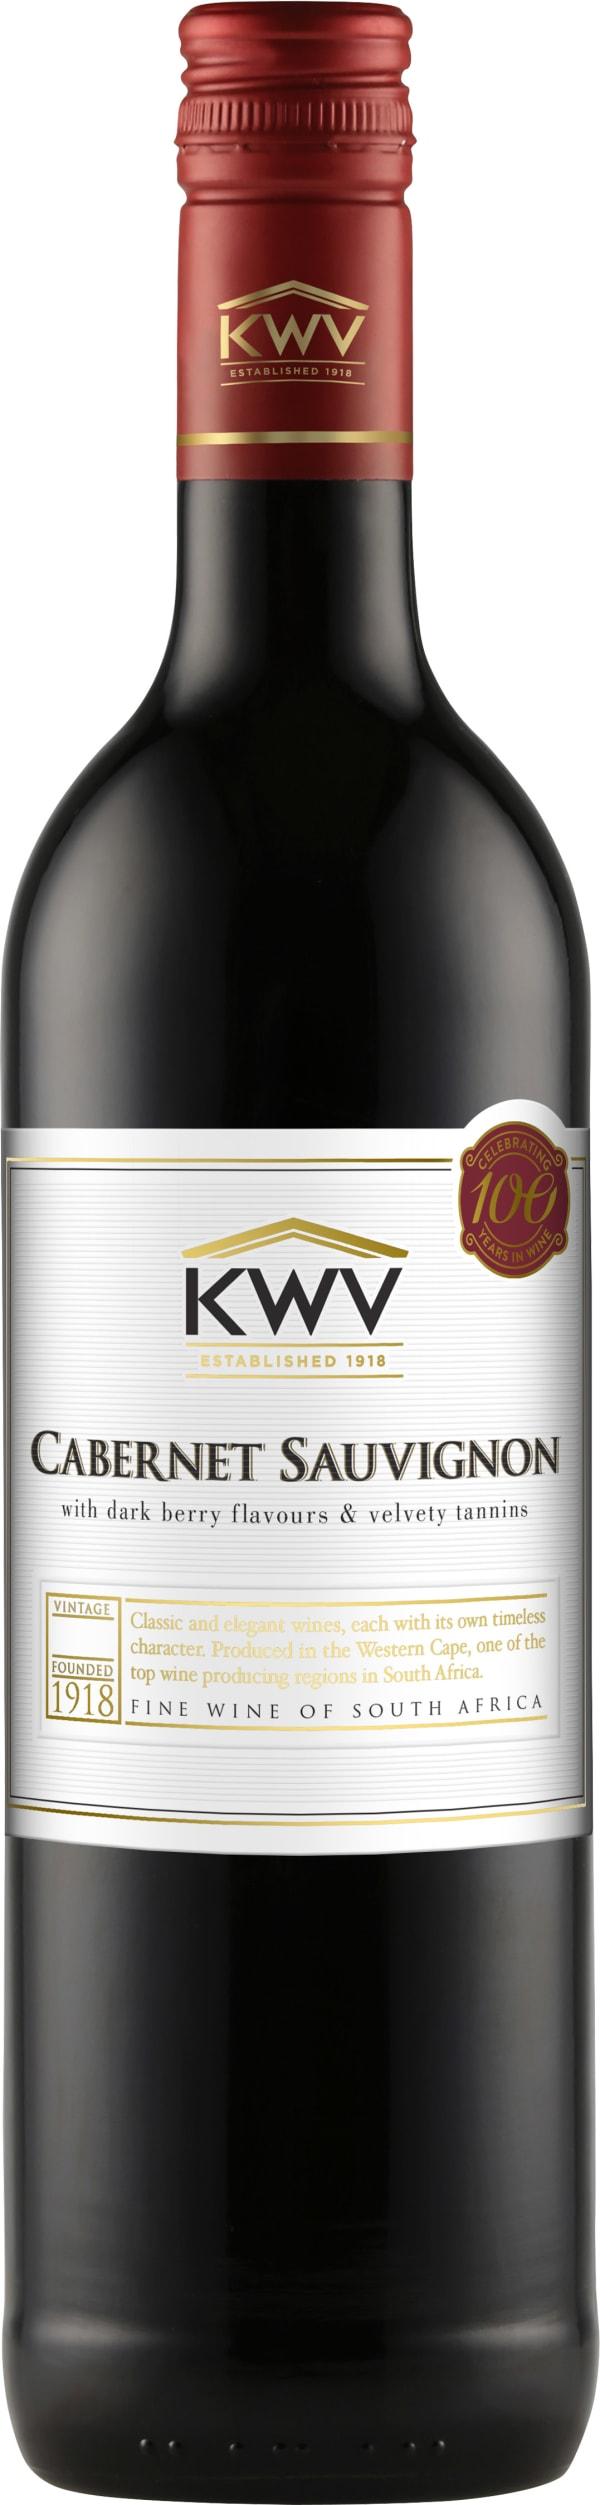 KWV Classic Collection Cabernet Sauvignon 2016